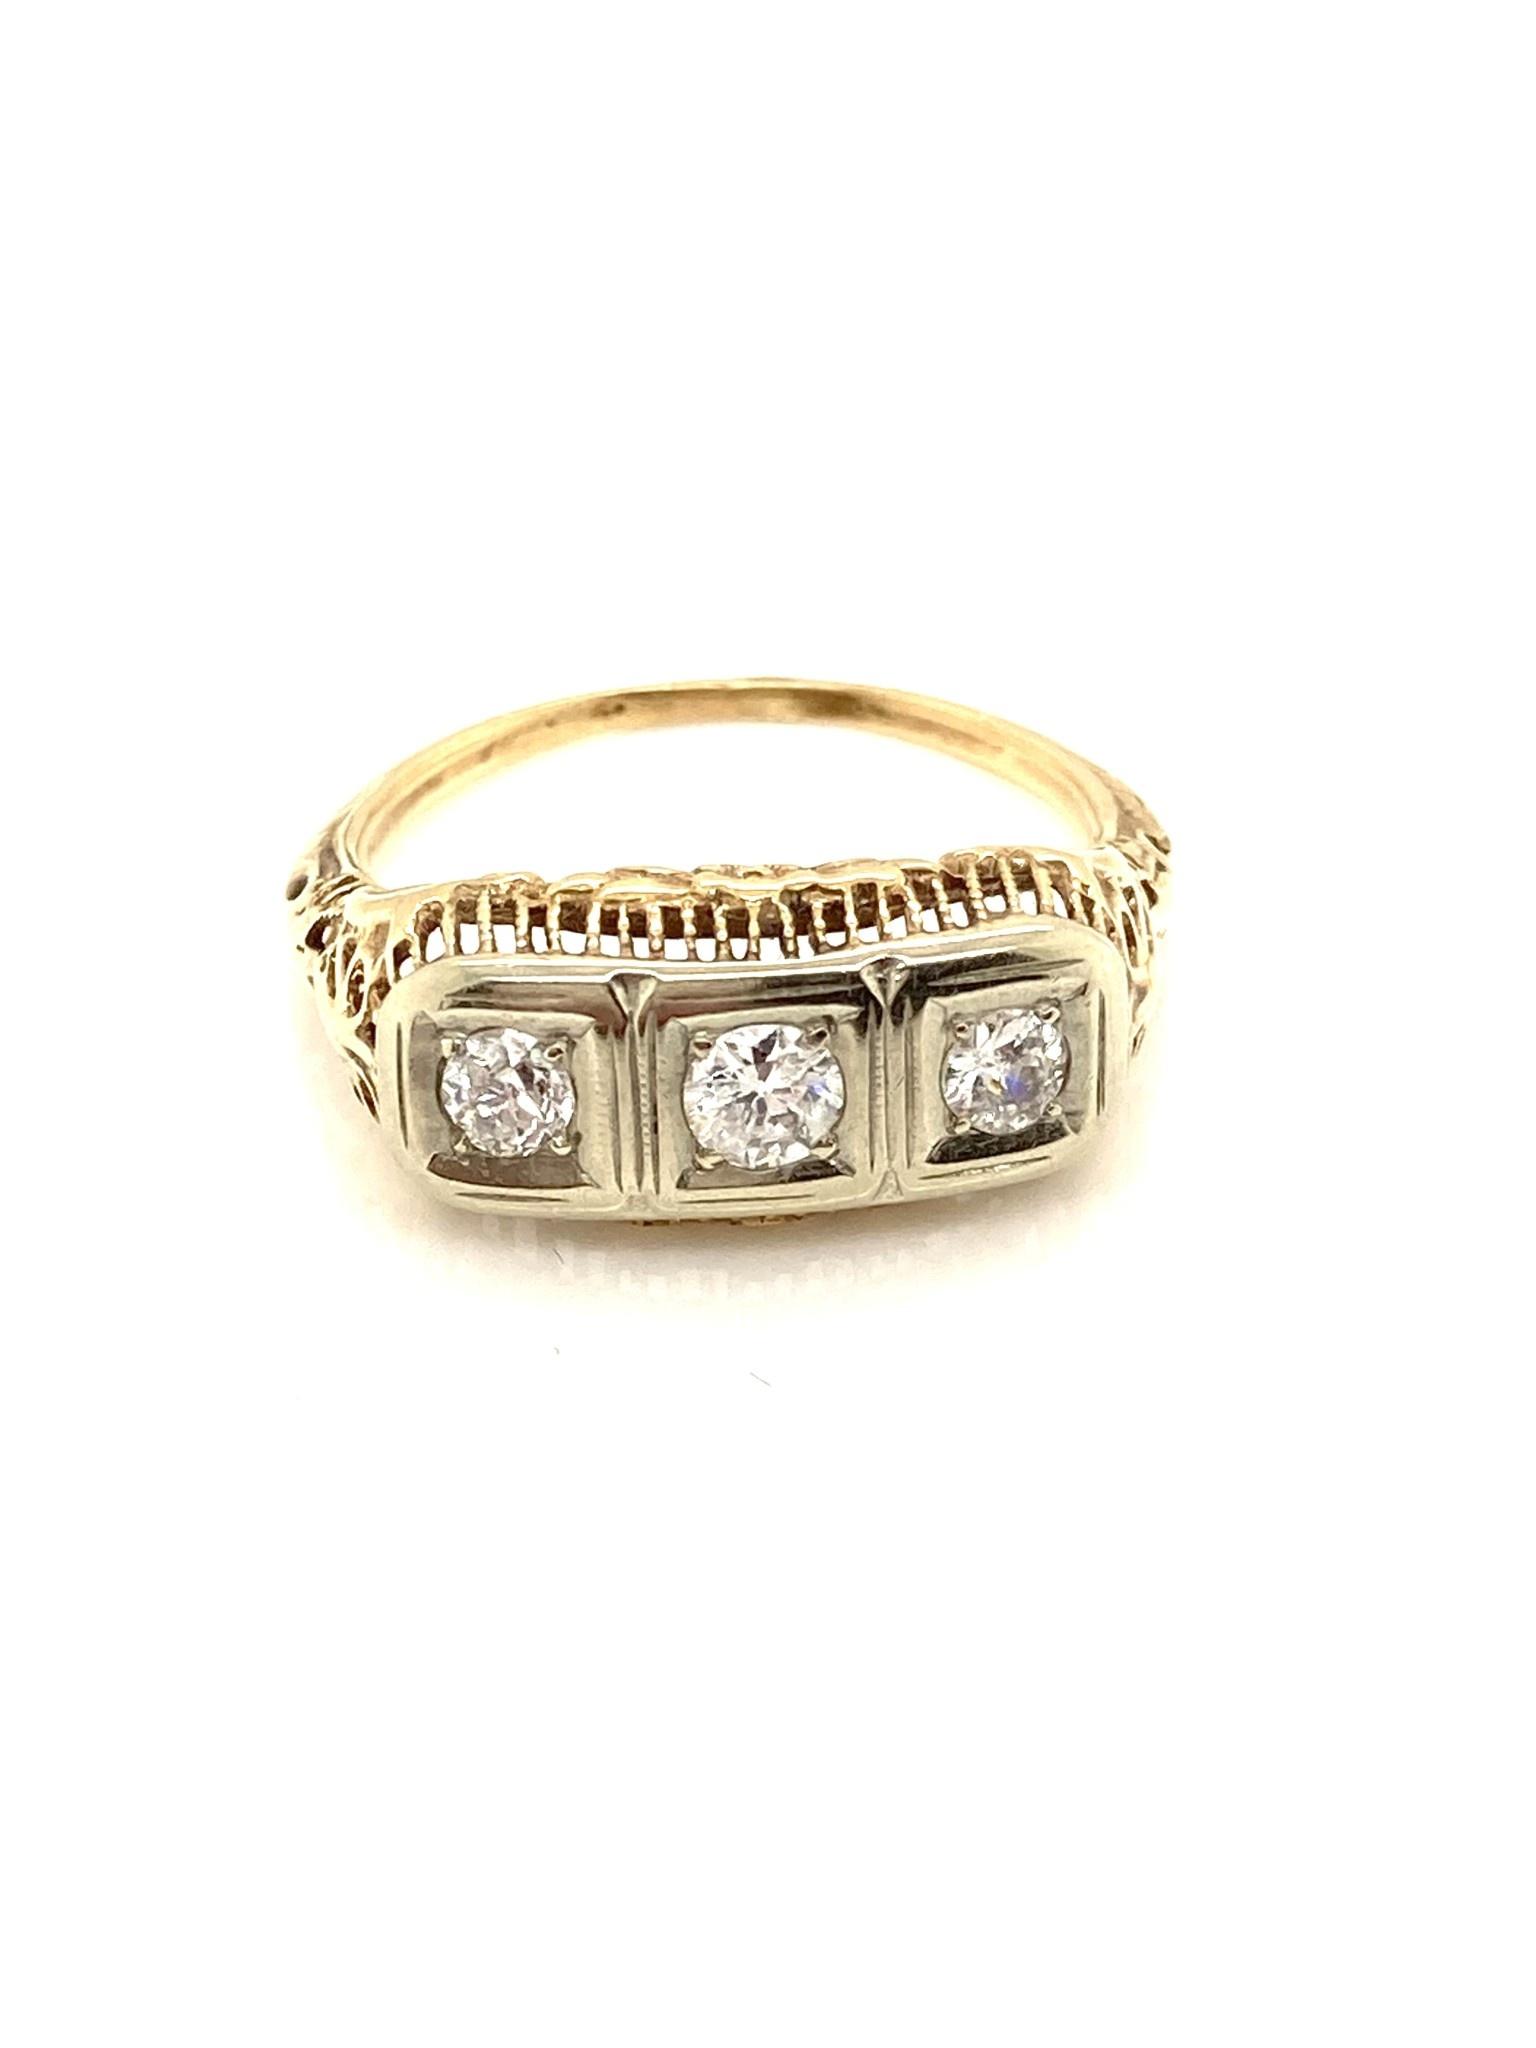 14K Yellow Gold 3 Stone Bar Style Ring